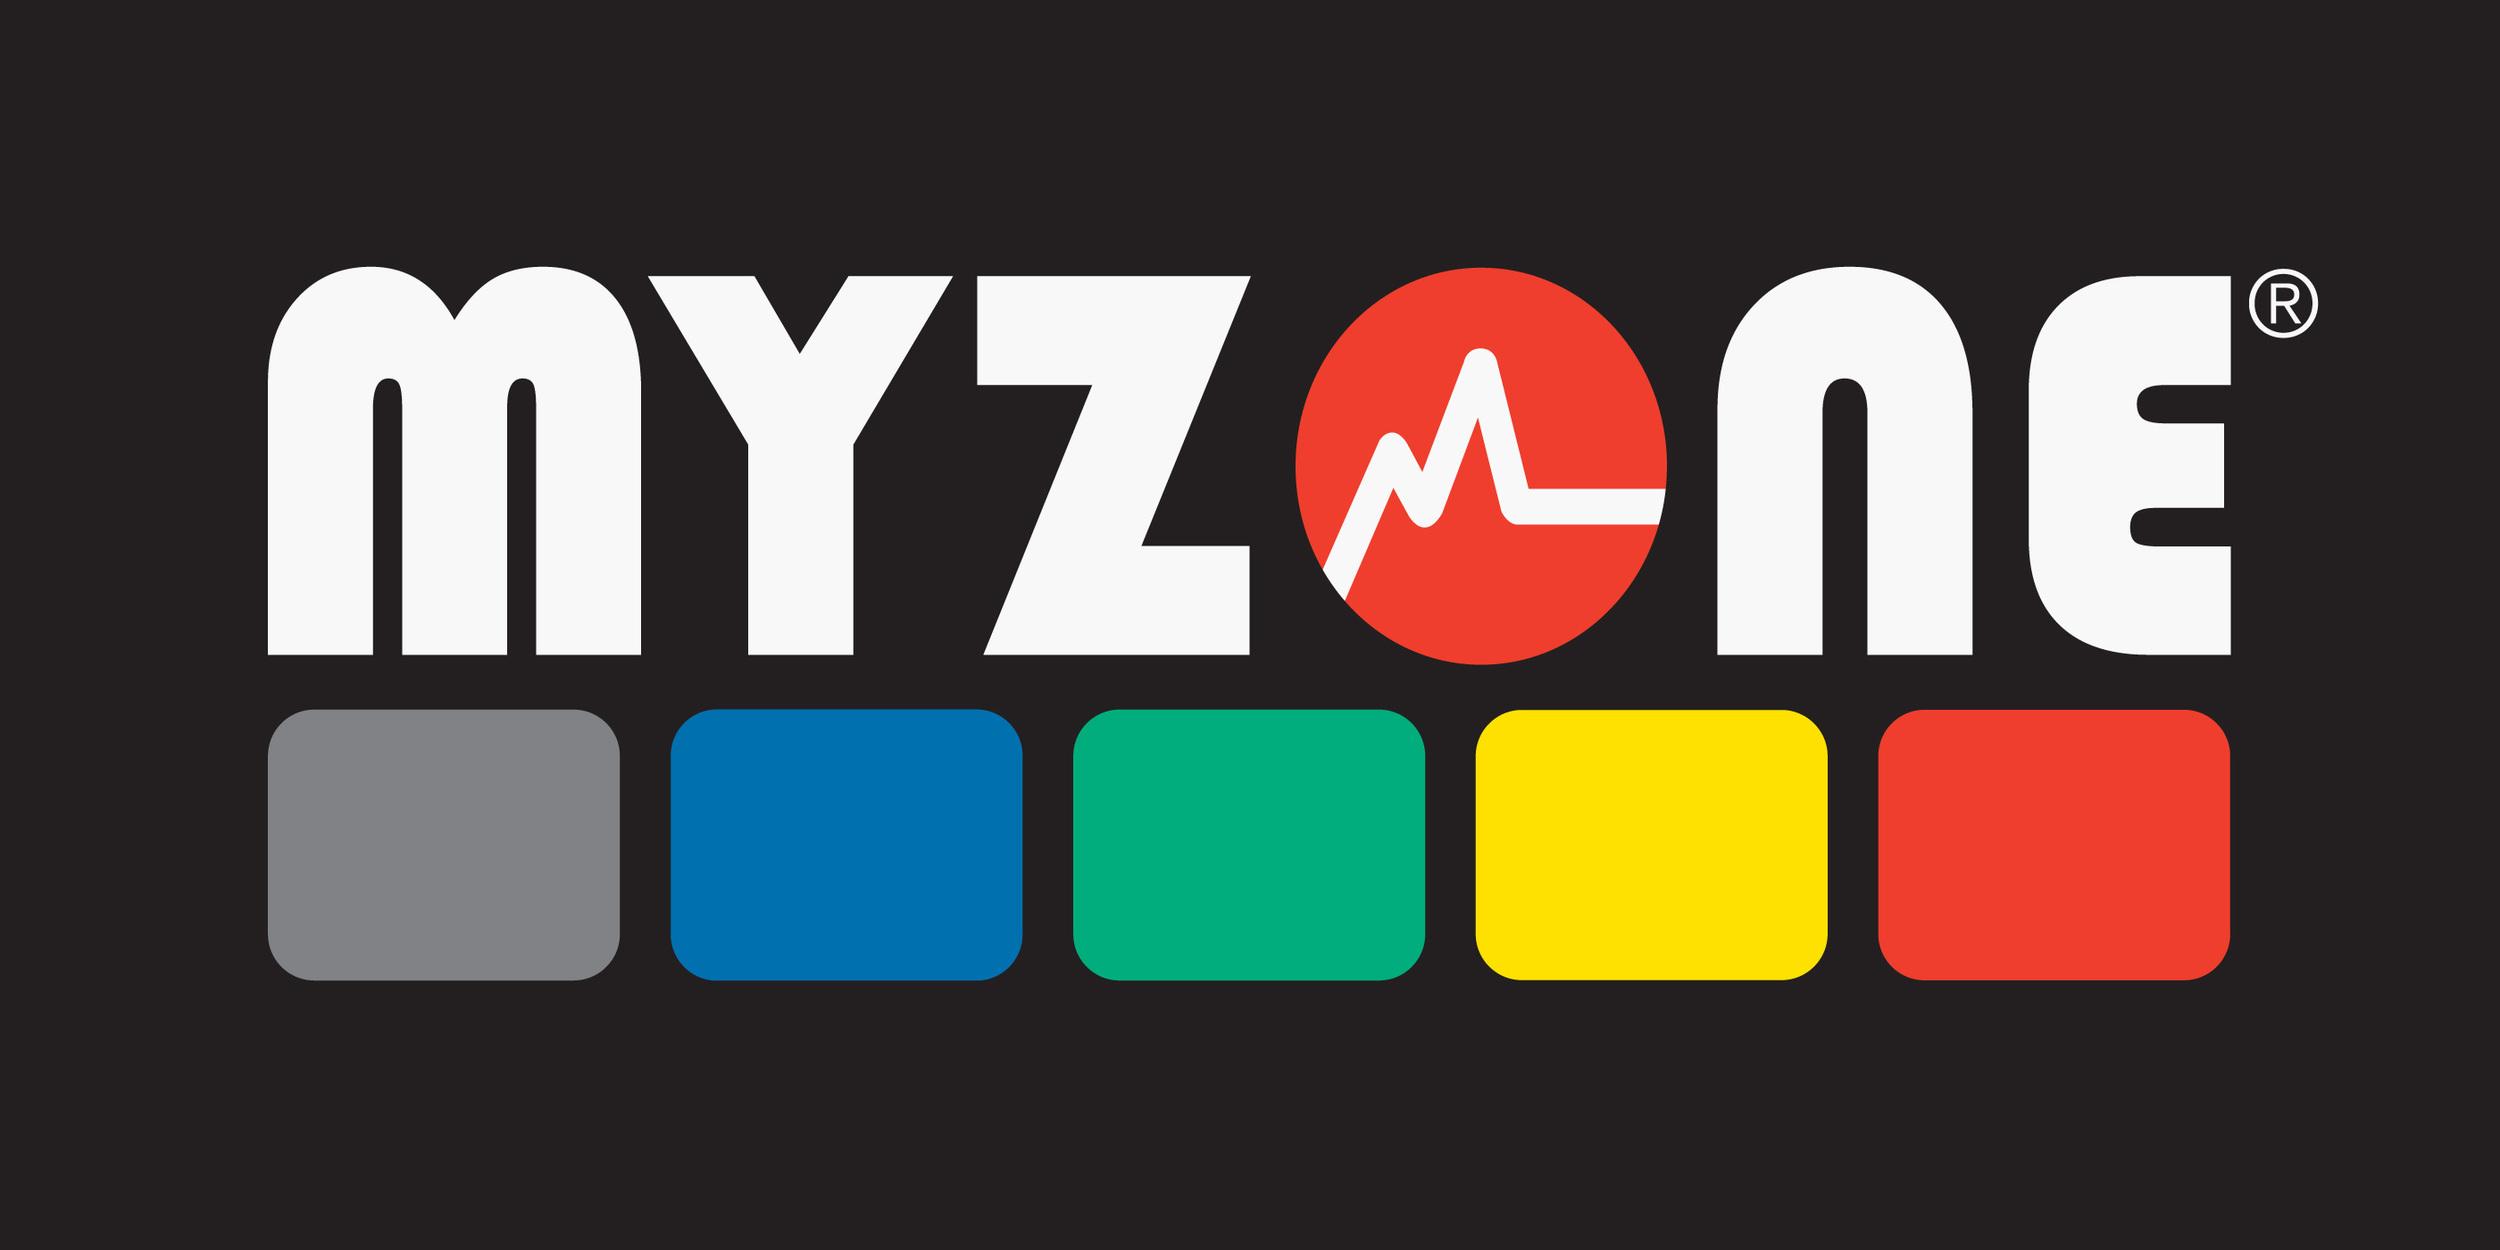 basic-company-logo_full-color-with-white-text,-background-i_2800x1400.jpg